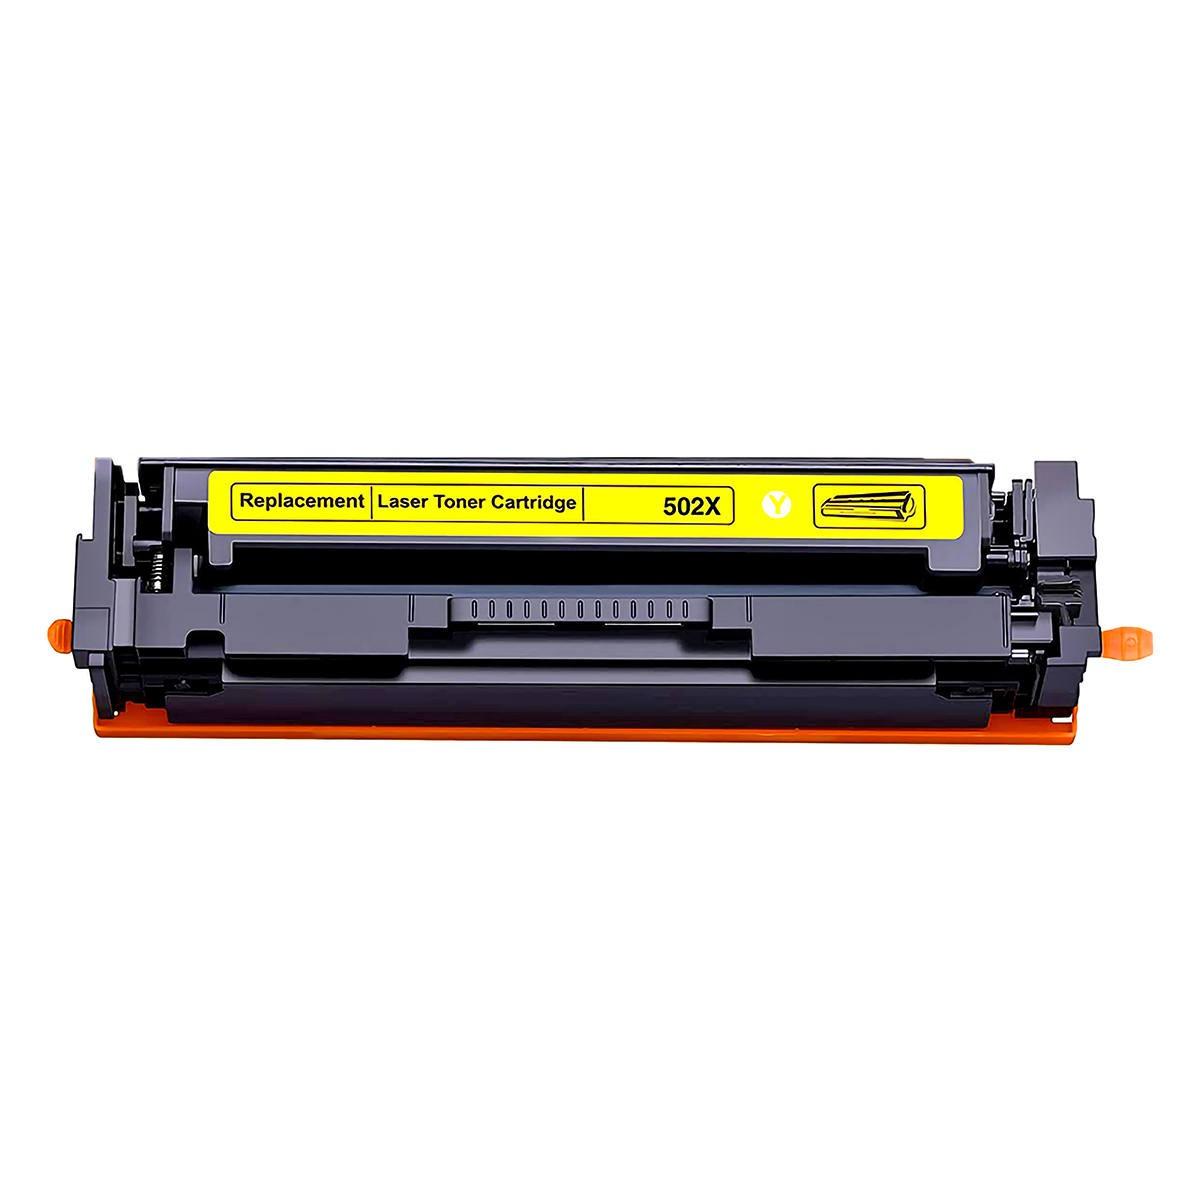 Compatível: Toner CF-502X 202X para Impressora HP M281 M 281nw M280 M 280nw M254 M 254dn M 254dw Amarelo 2.500